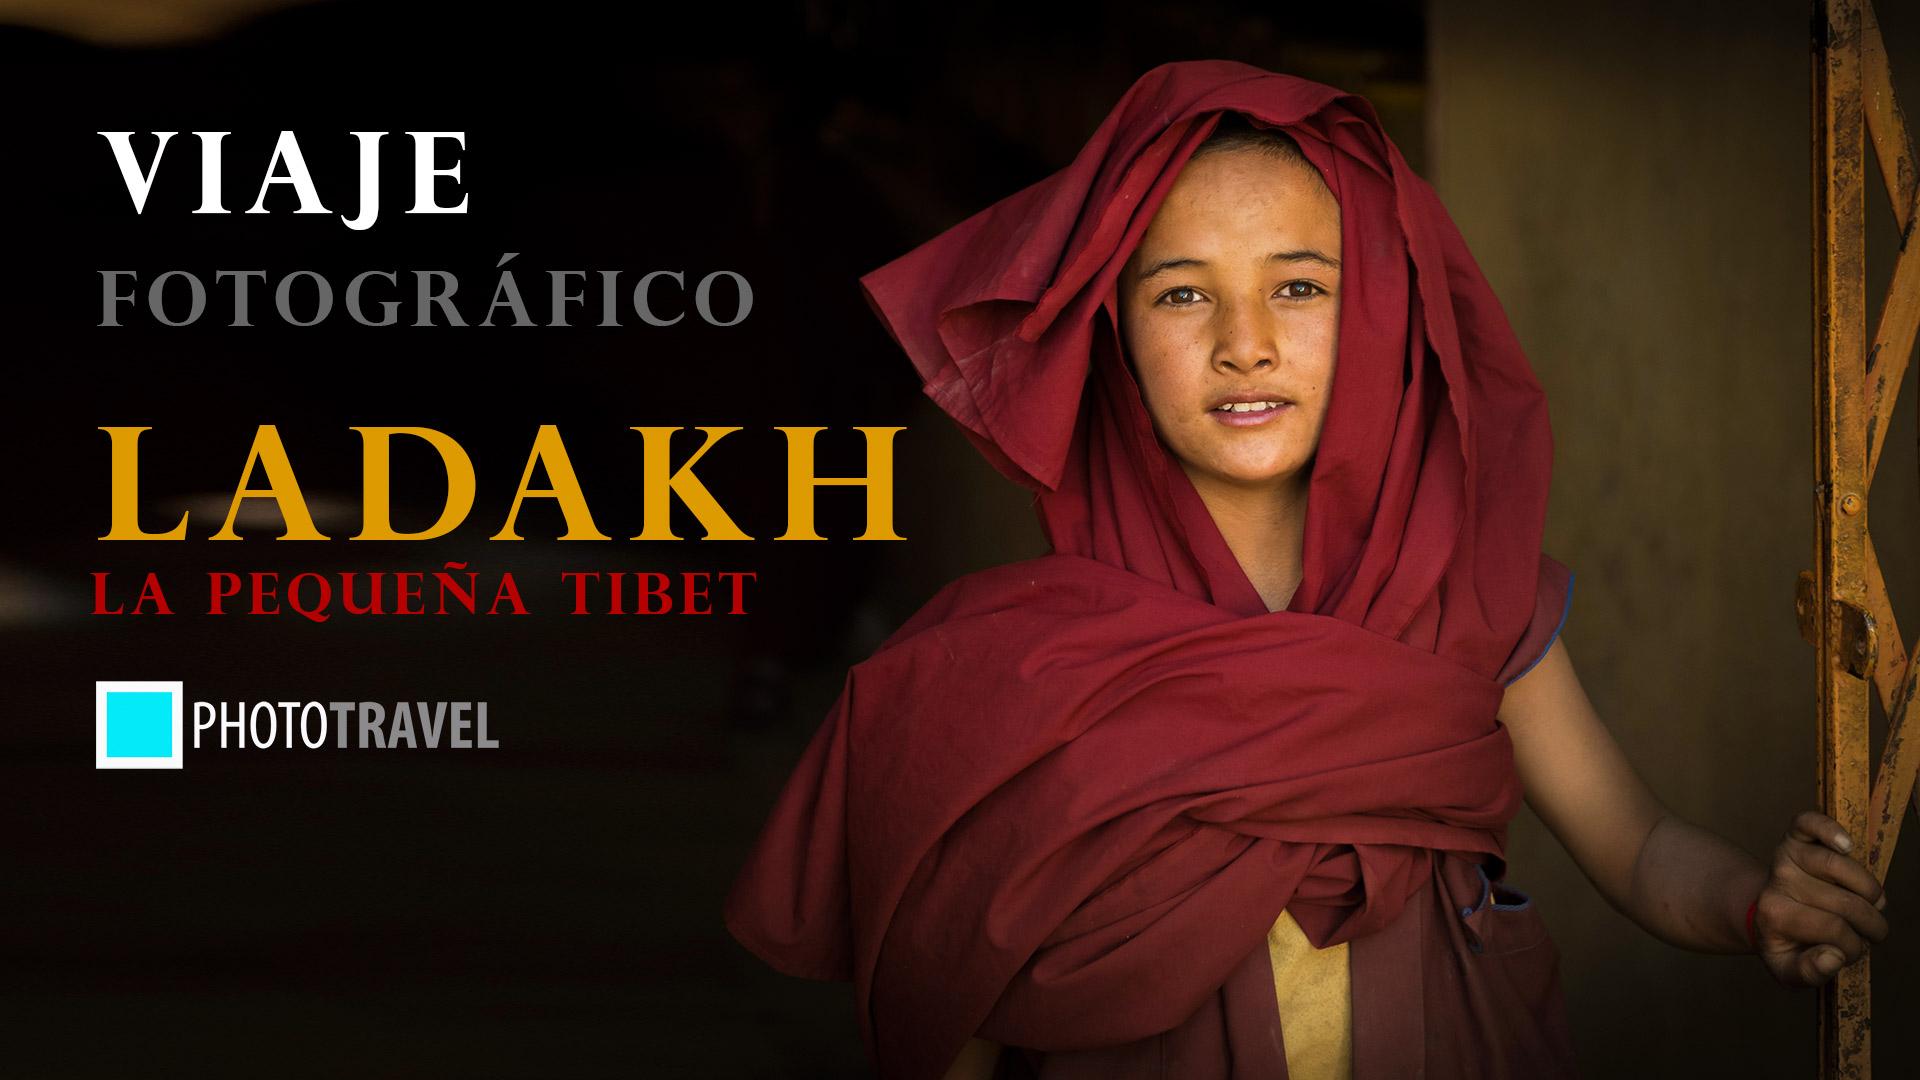 viajes fotograficos ladakh